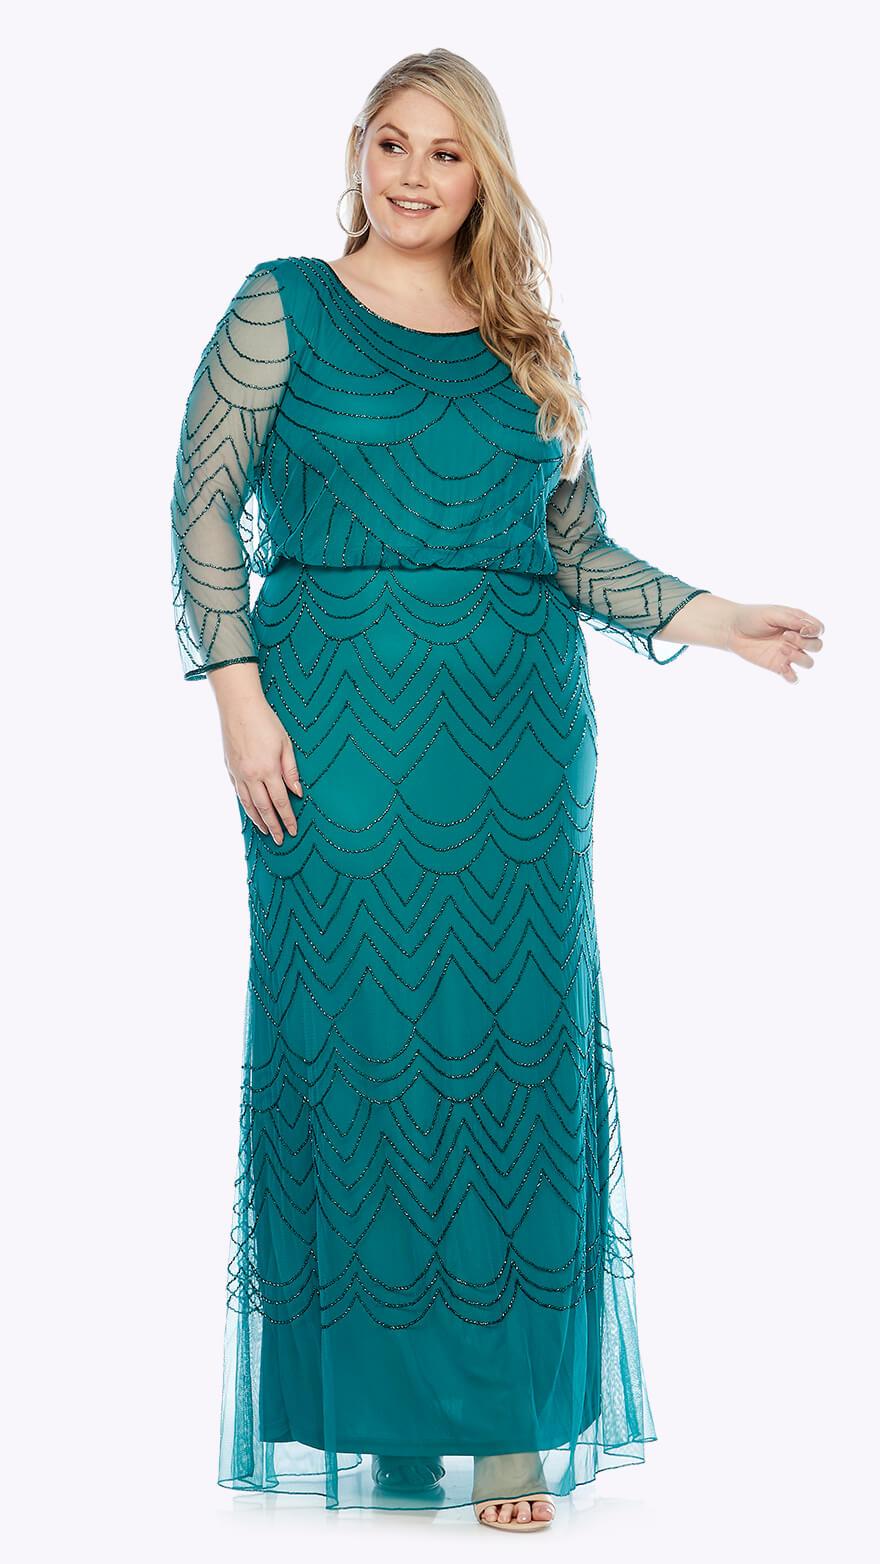 LJ0317 Full-length 3/4 sleeve blouson style beaded gown in scallop pattern